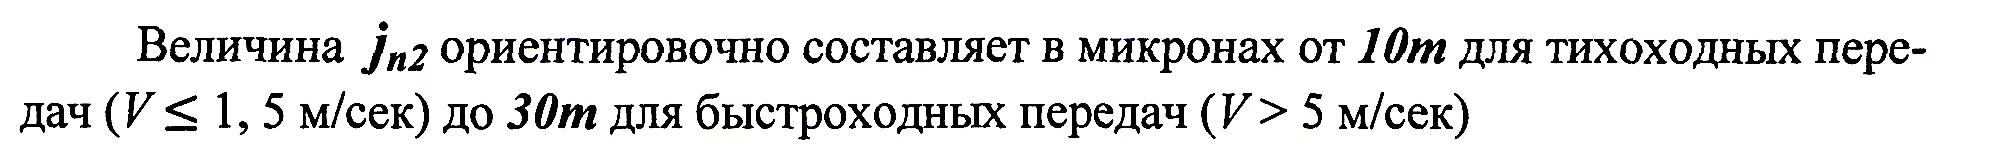 Рис 15Г